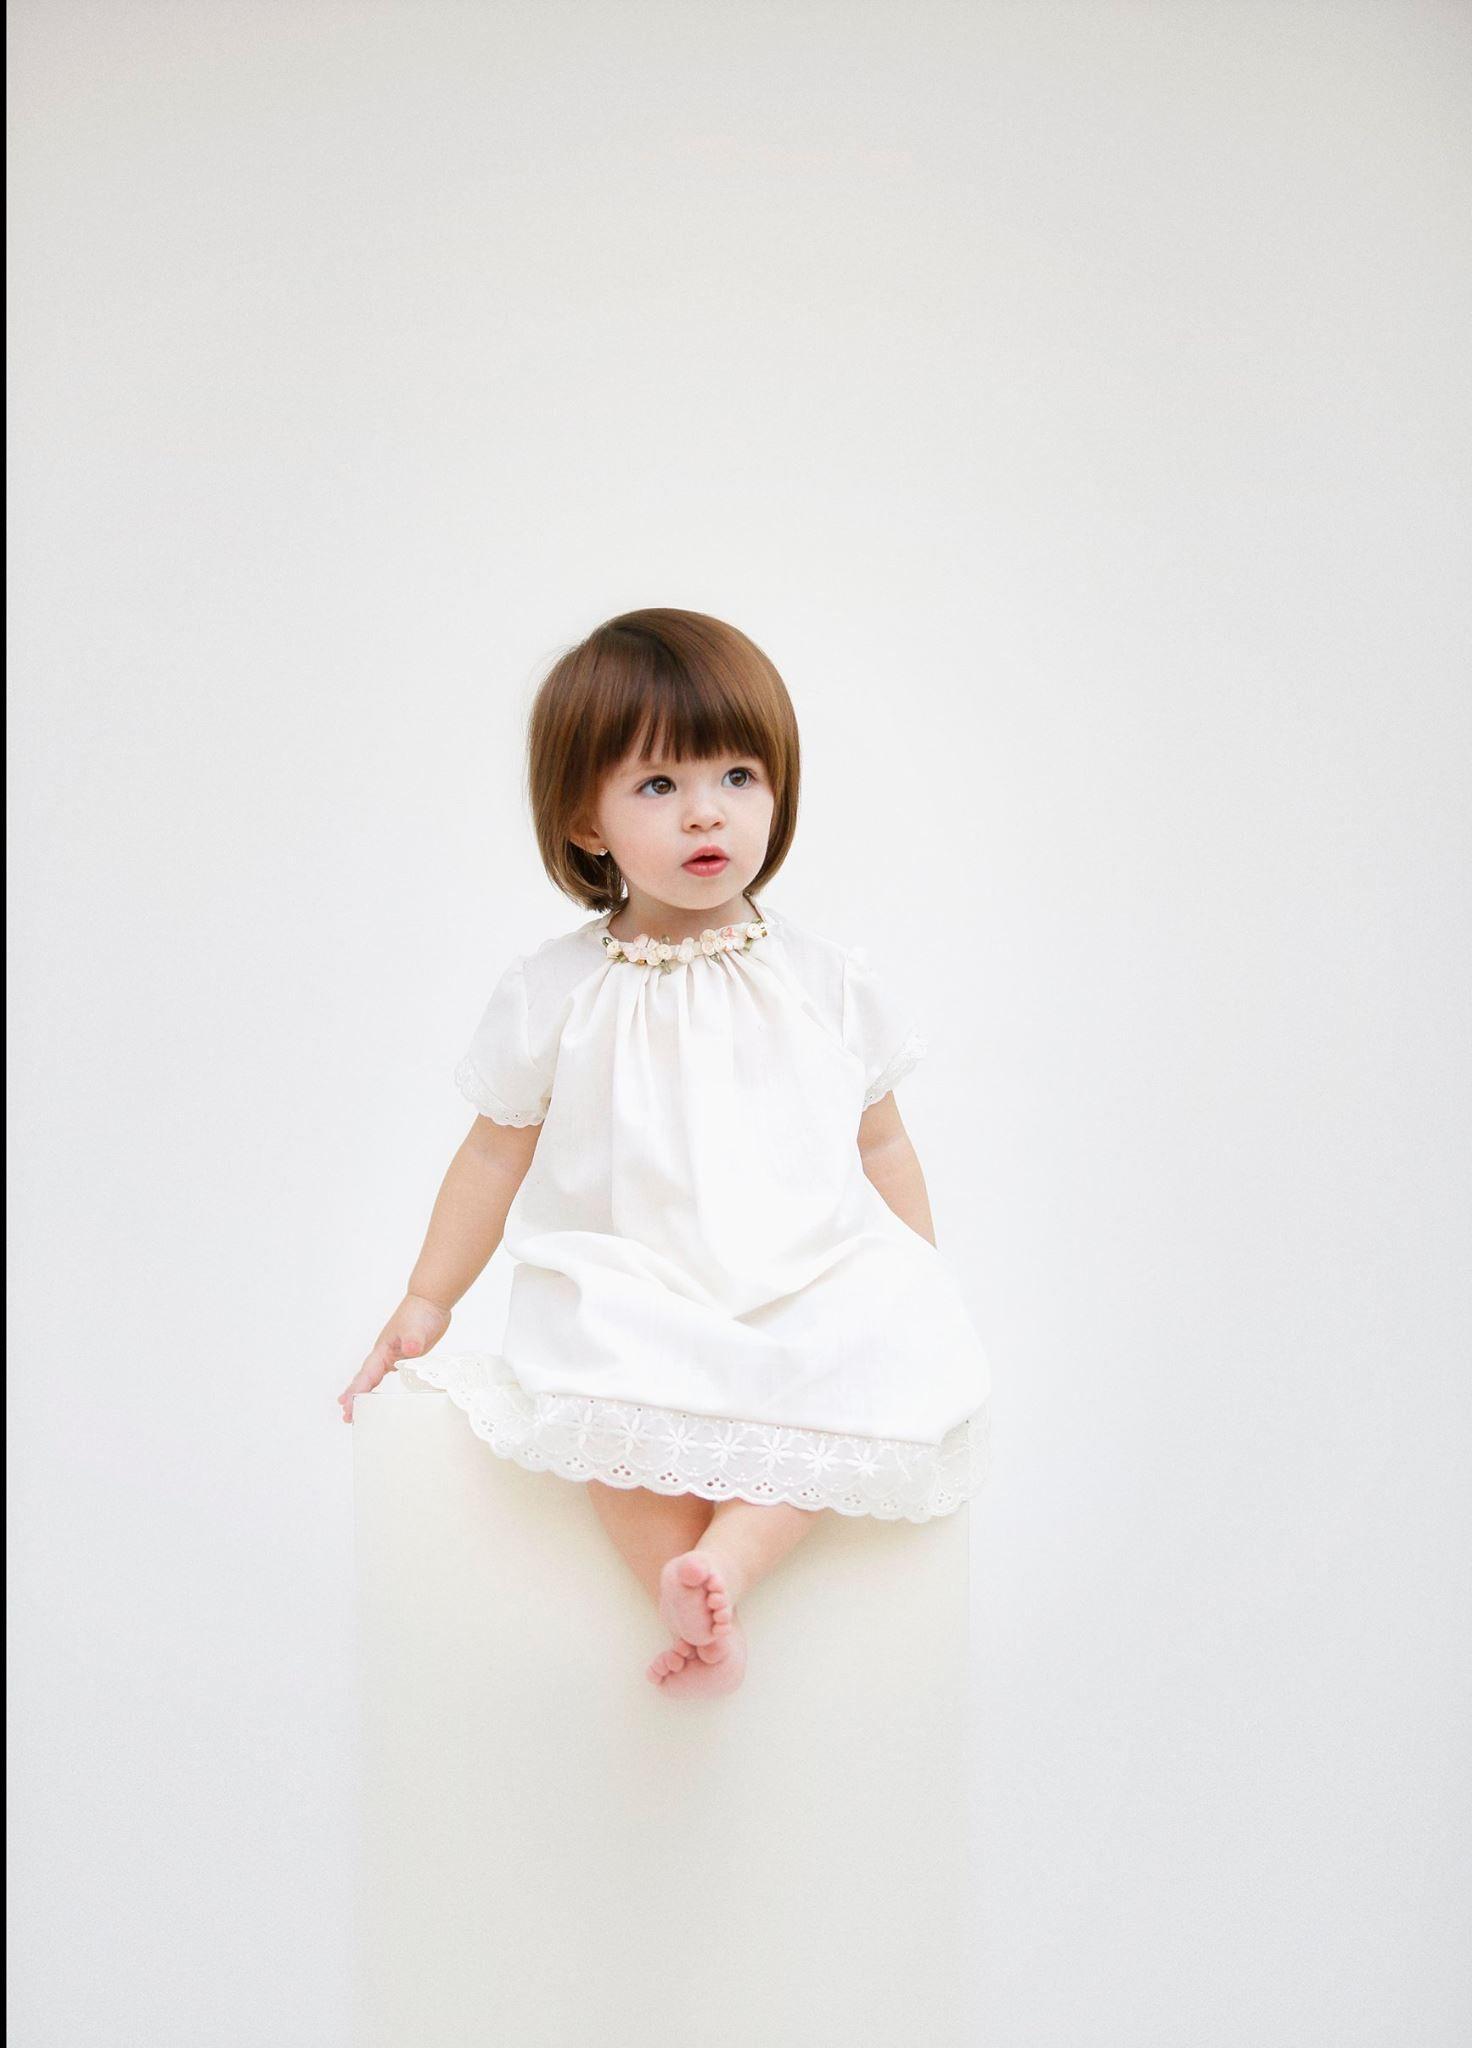 Little girl white dress simple girly petit kids little fashionista